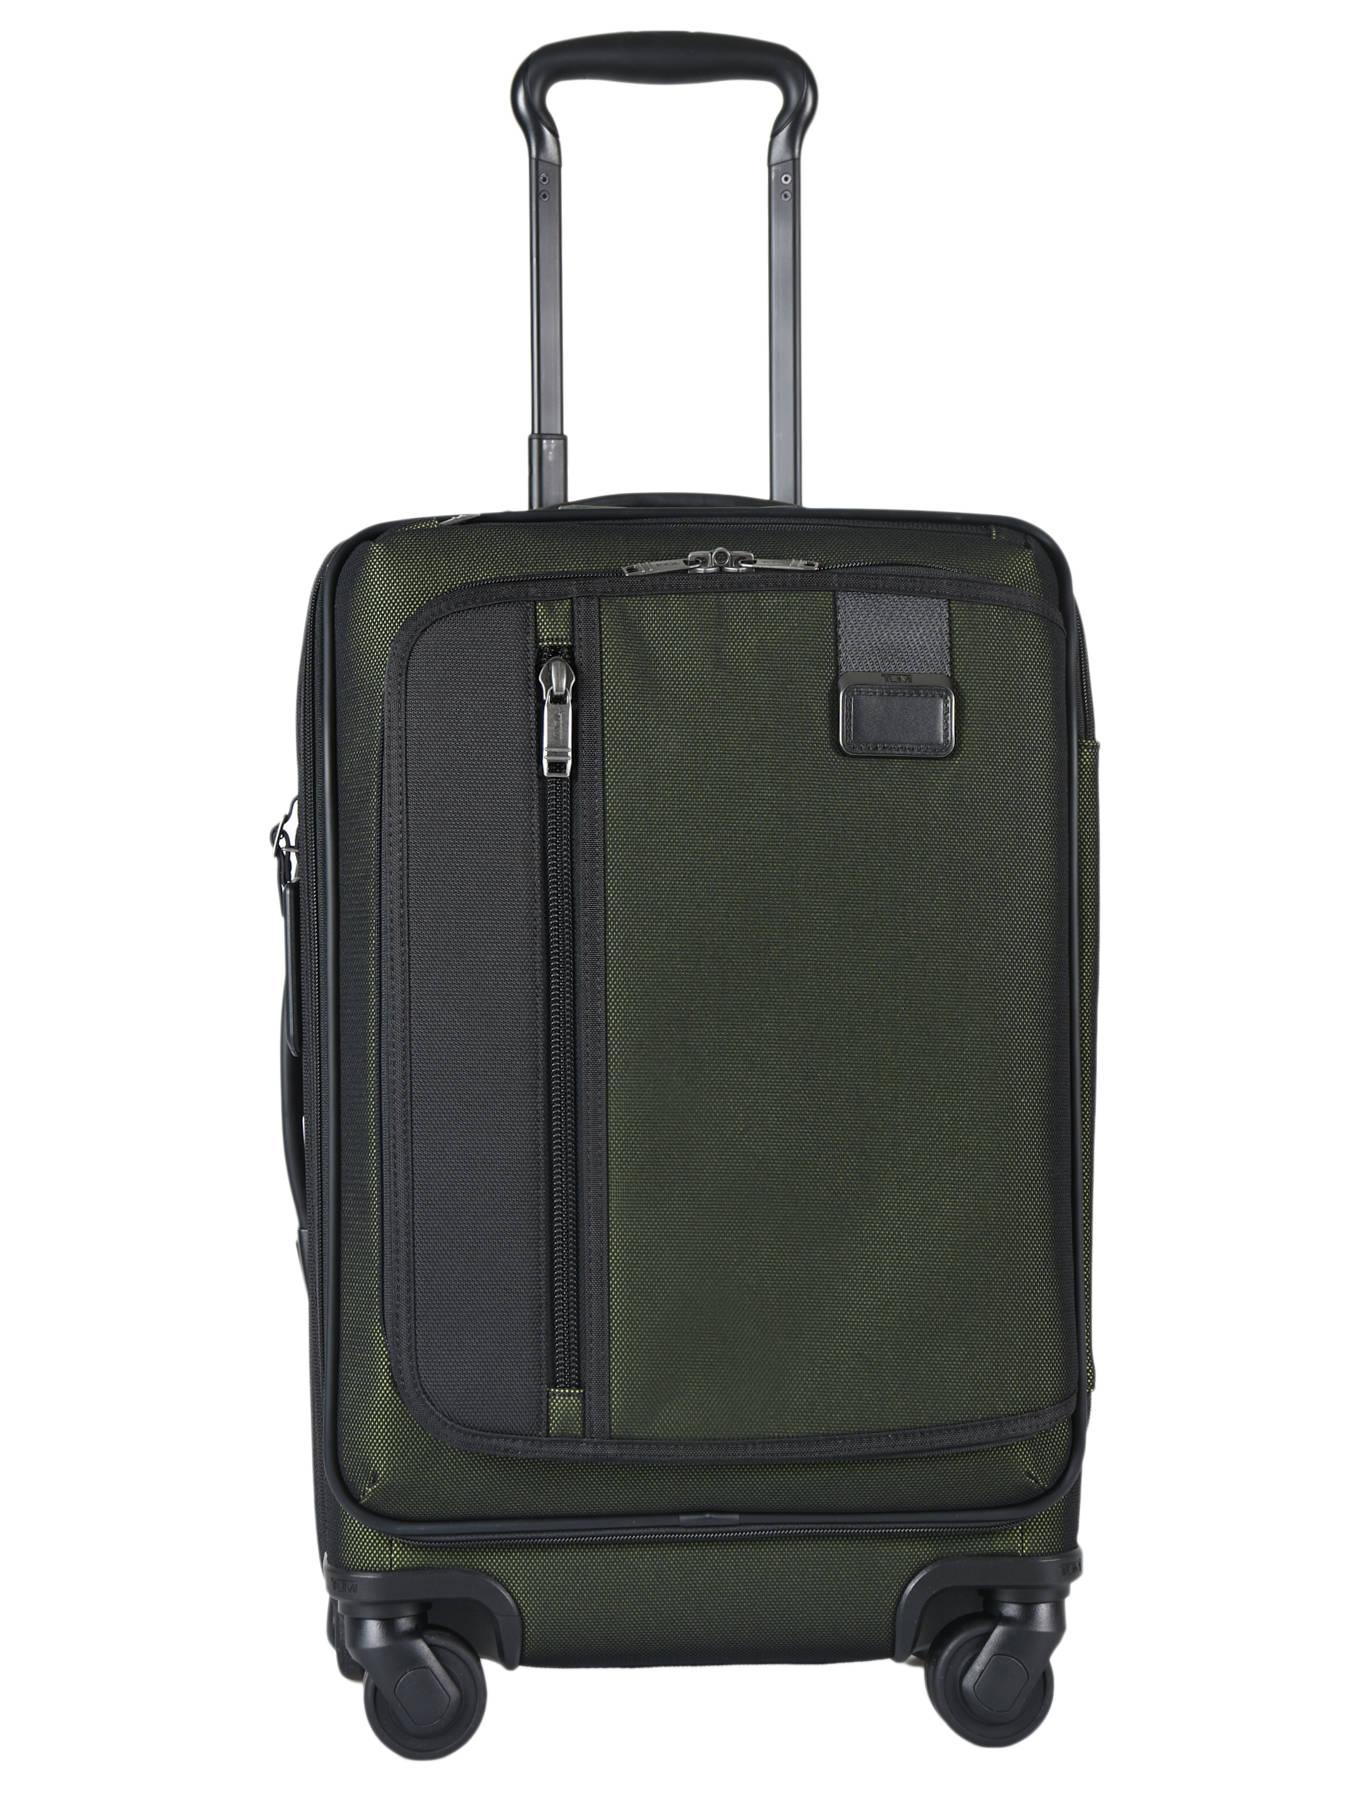 6e21a70fae1 Harde reiskoffers Tumi Merge 2228660 te koop aan de beste prijs